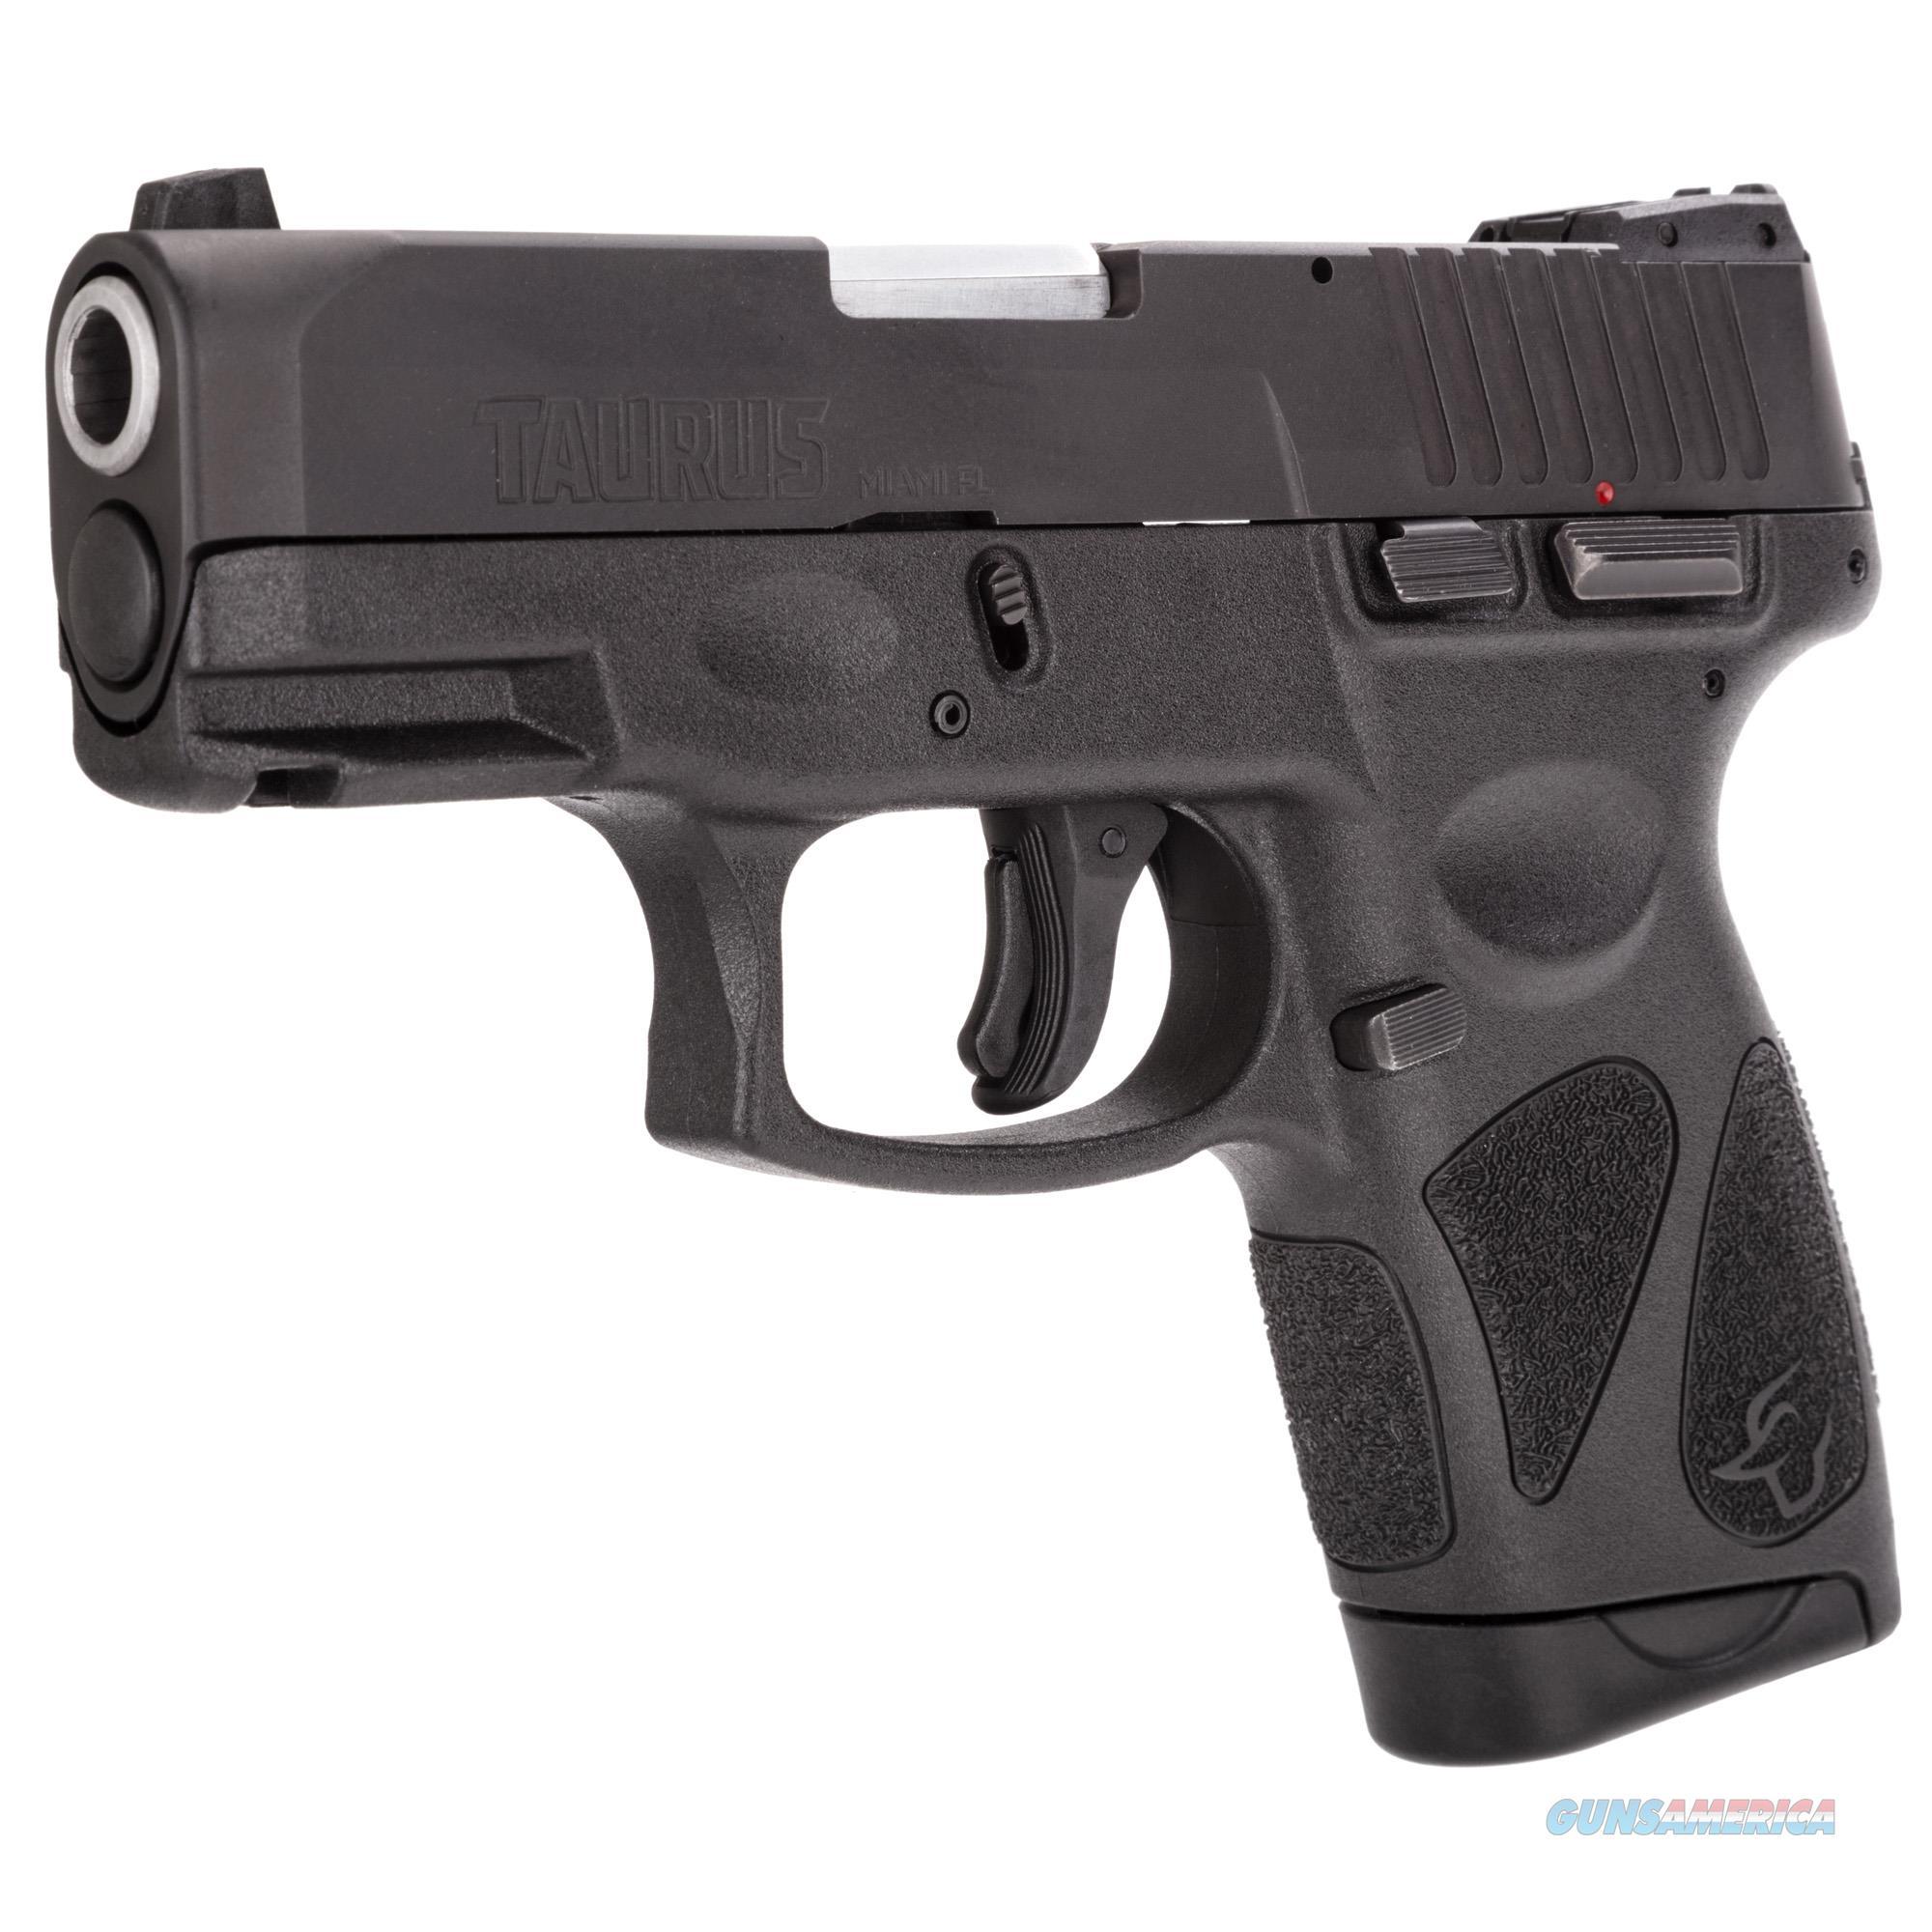 "Taurus G2S 9mm 3.25"" 7+1 - New in Box!  Guns > Pistols > Taurus Pistols > Semi Auto Pistols > Polymer Frame"